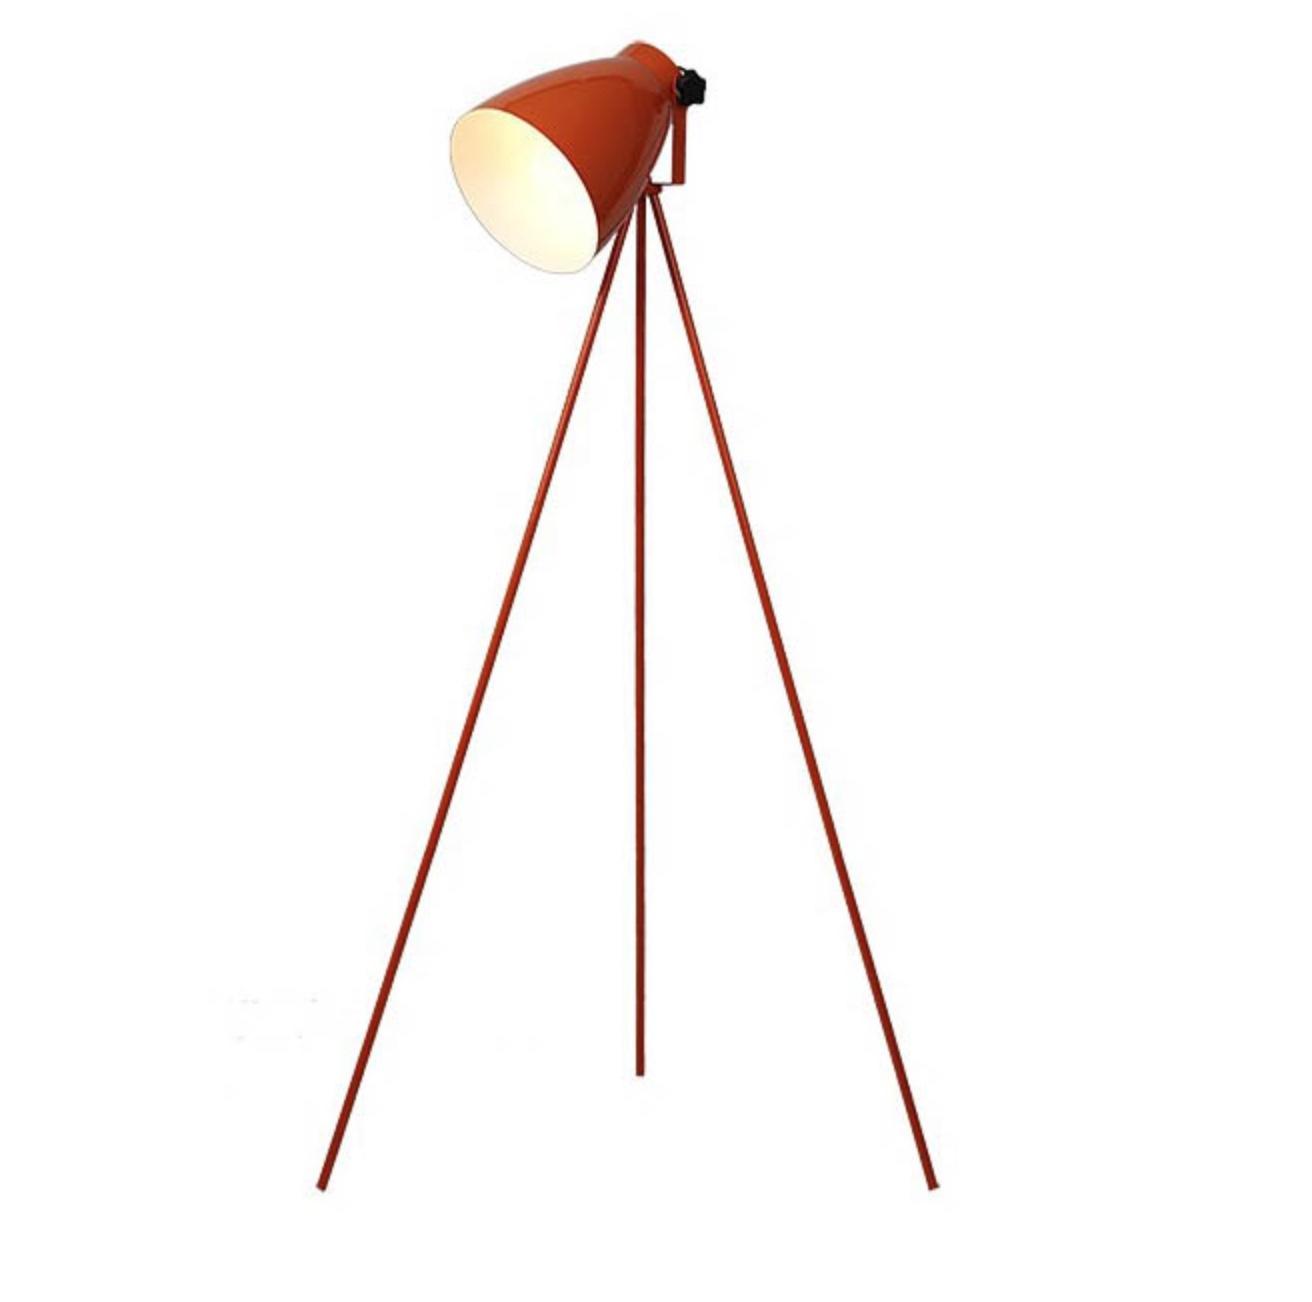 Floor Lamps - Tripod, Orange Baked, Stem Floor Lamps